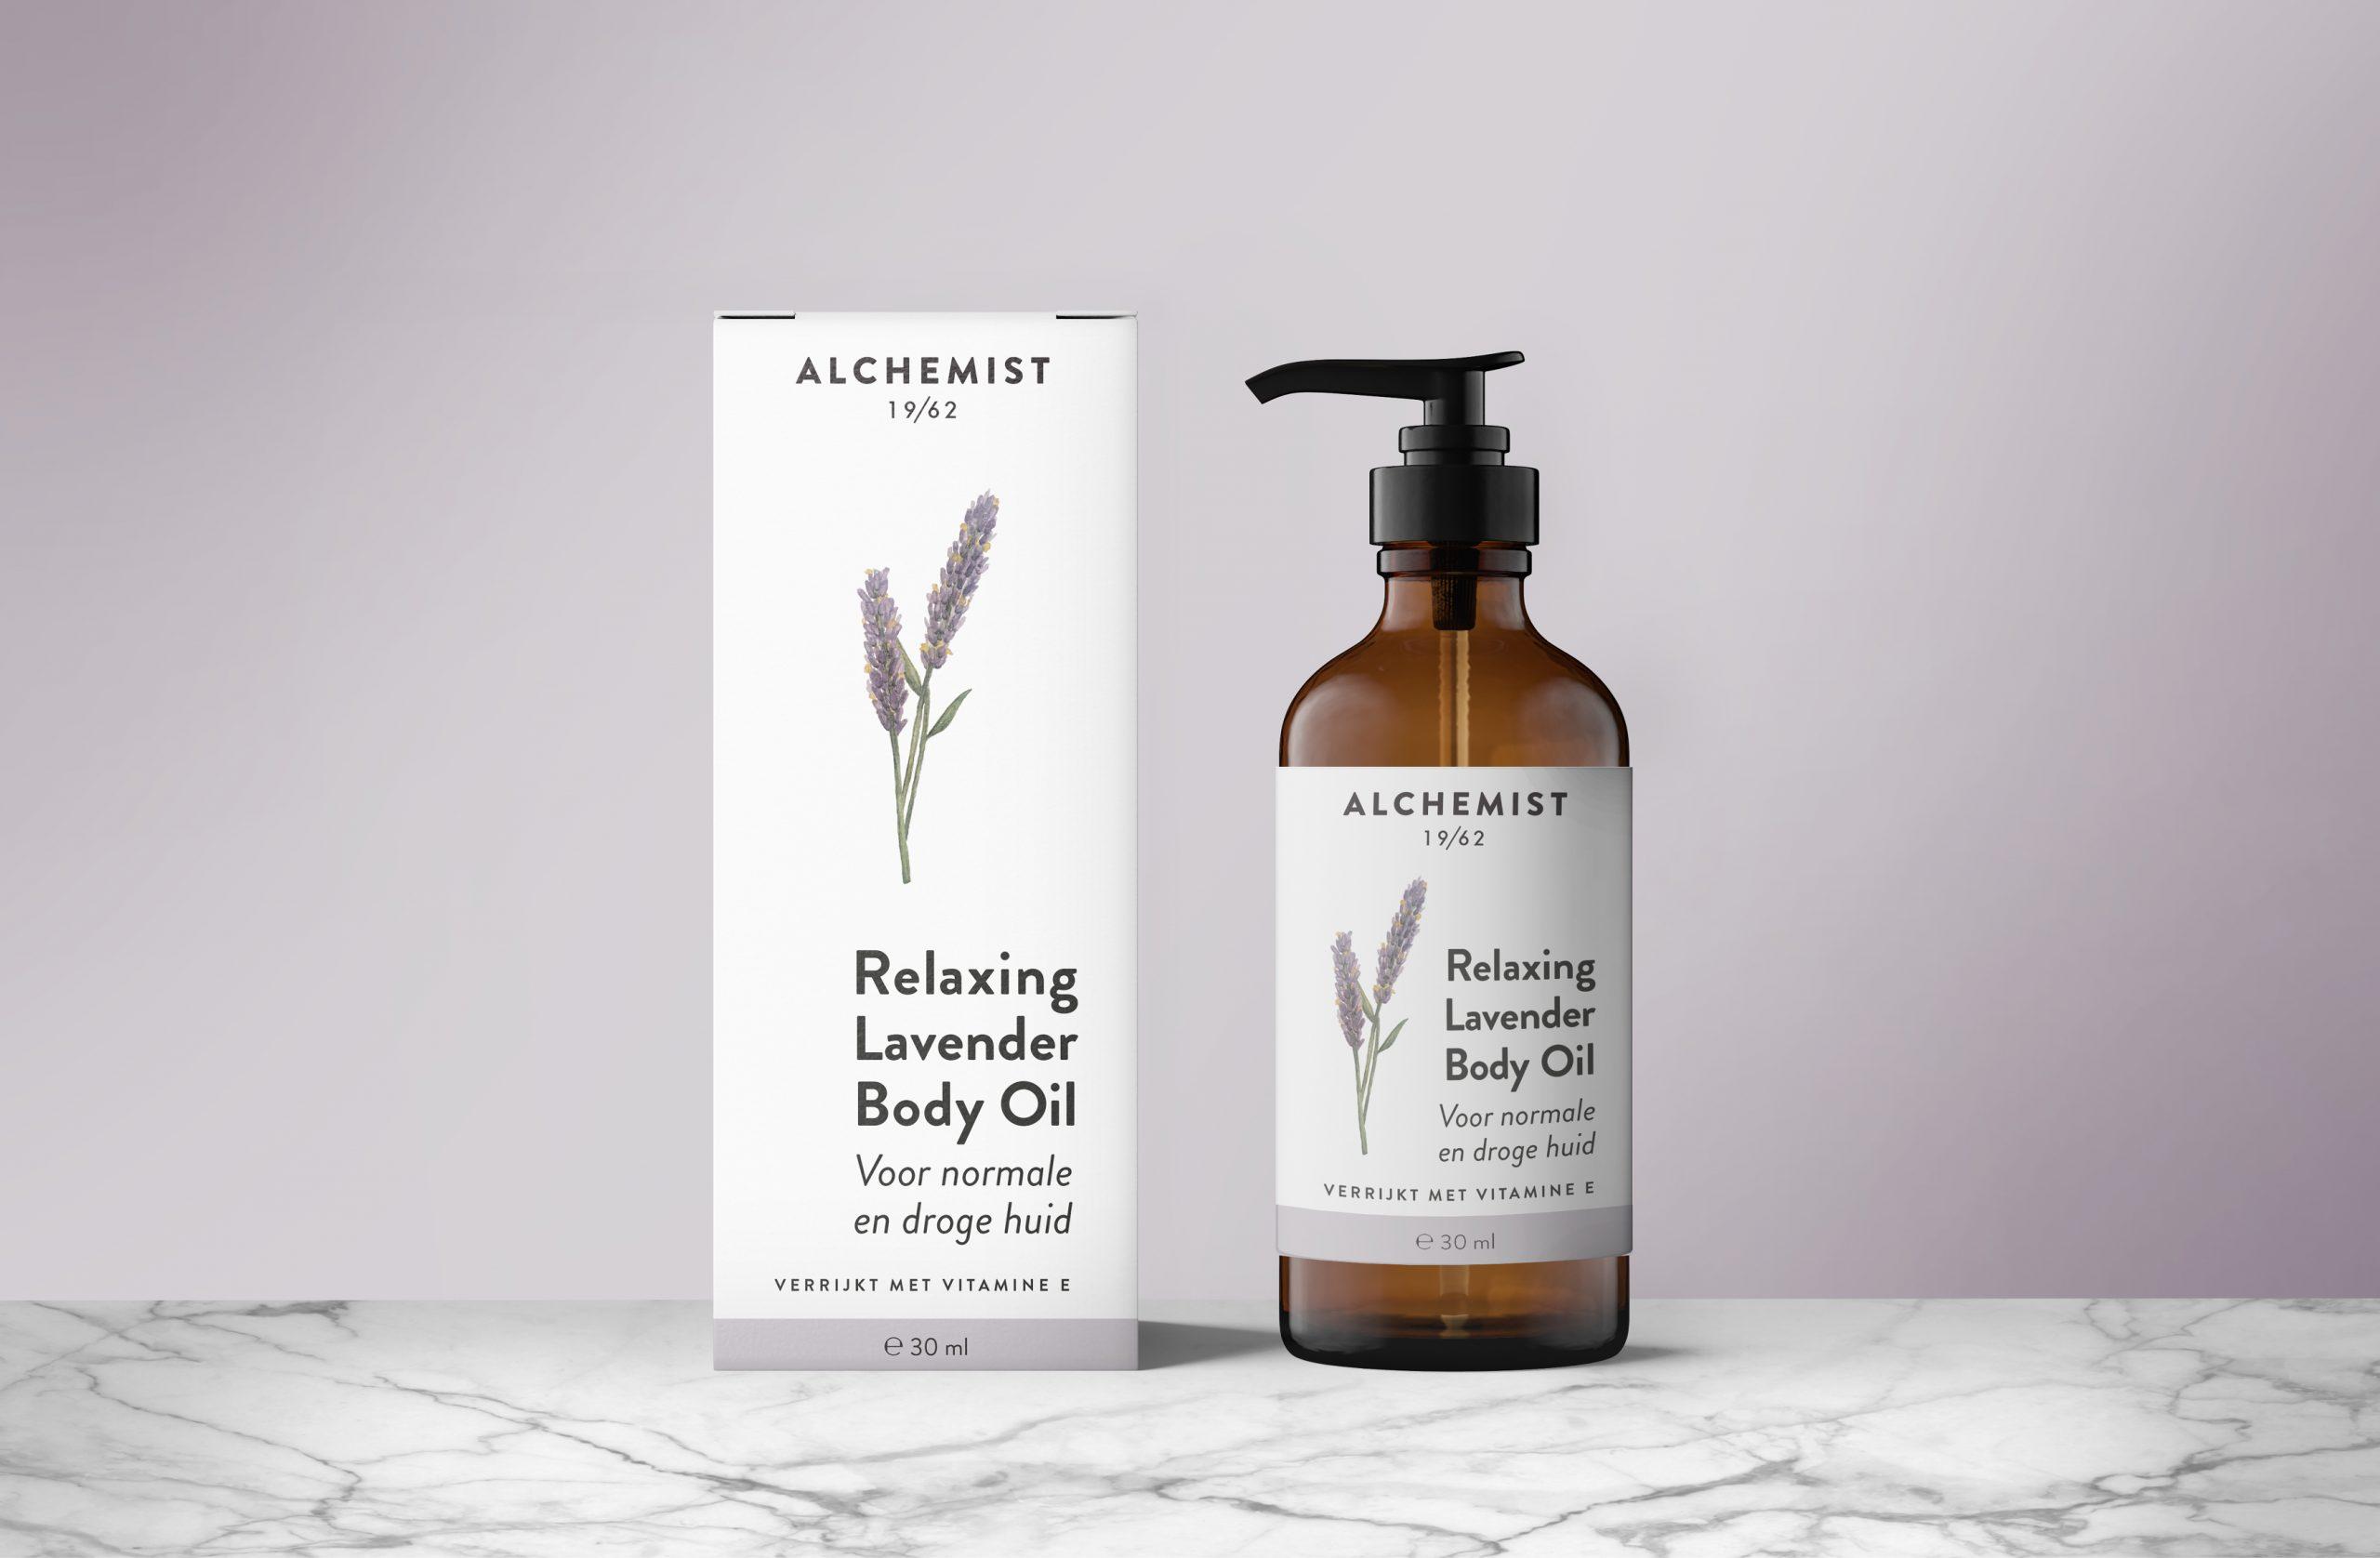 Alchemist Lavender body oil